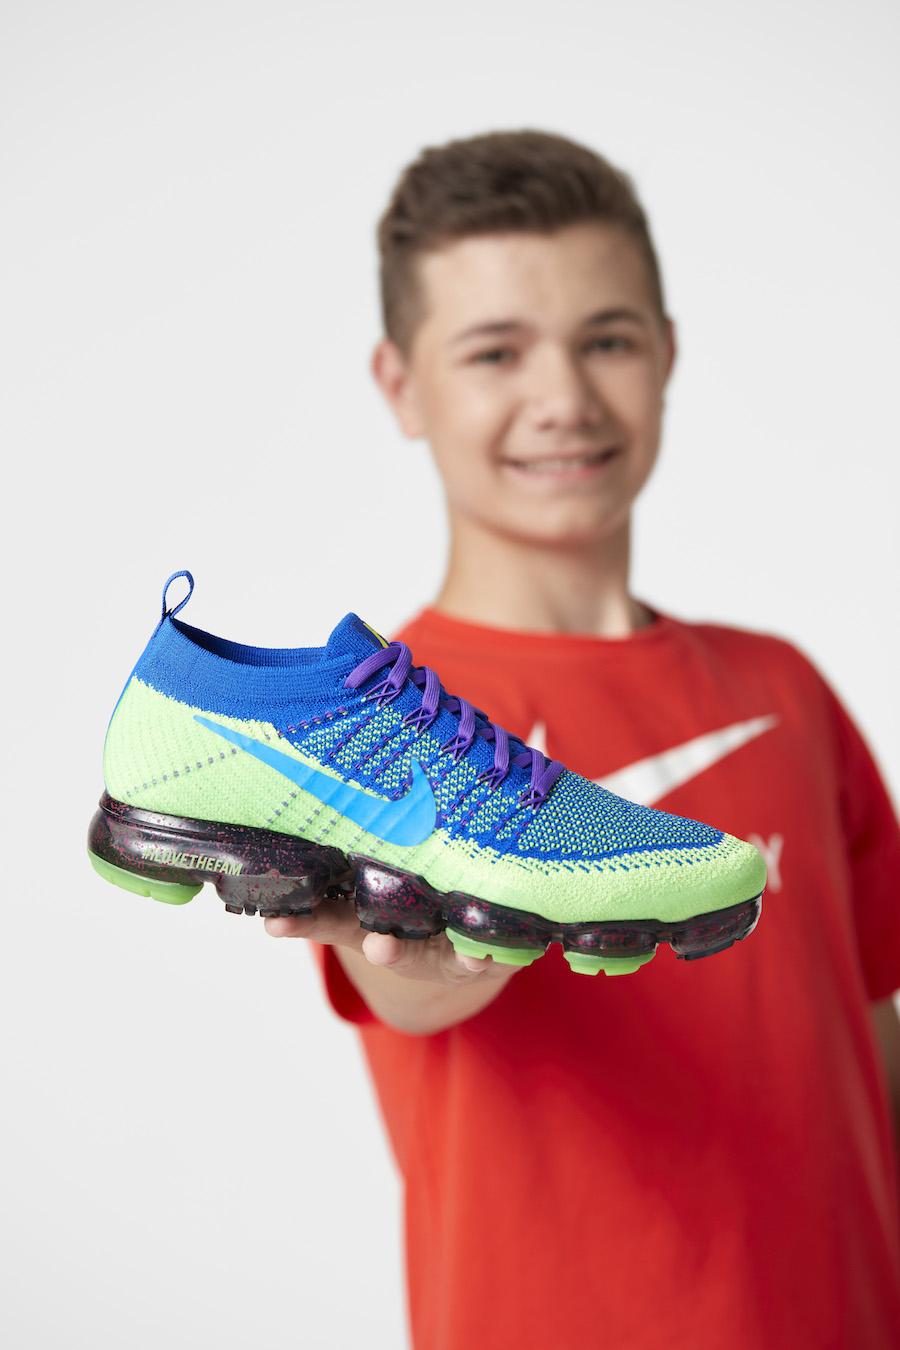 Andrew Merydith Nike Air VaporMax Doernbecher